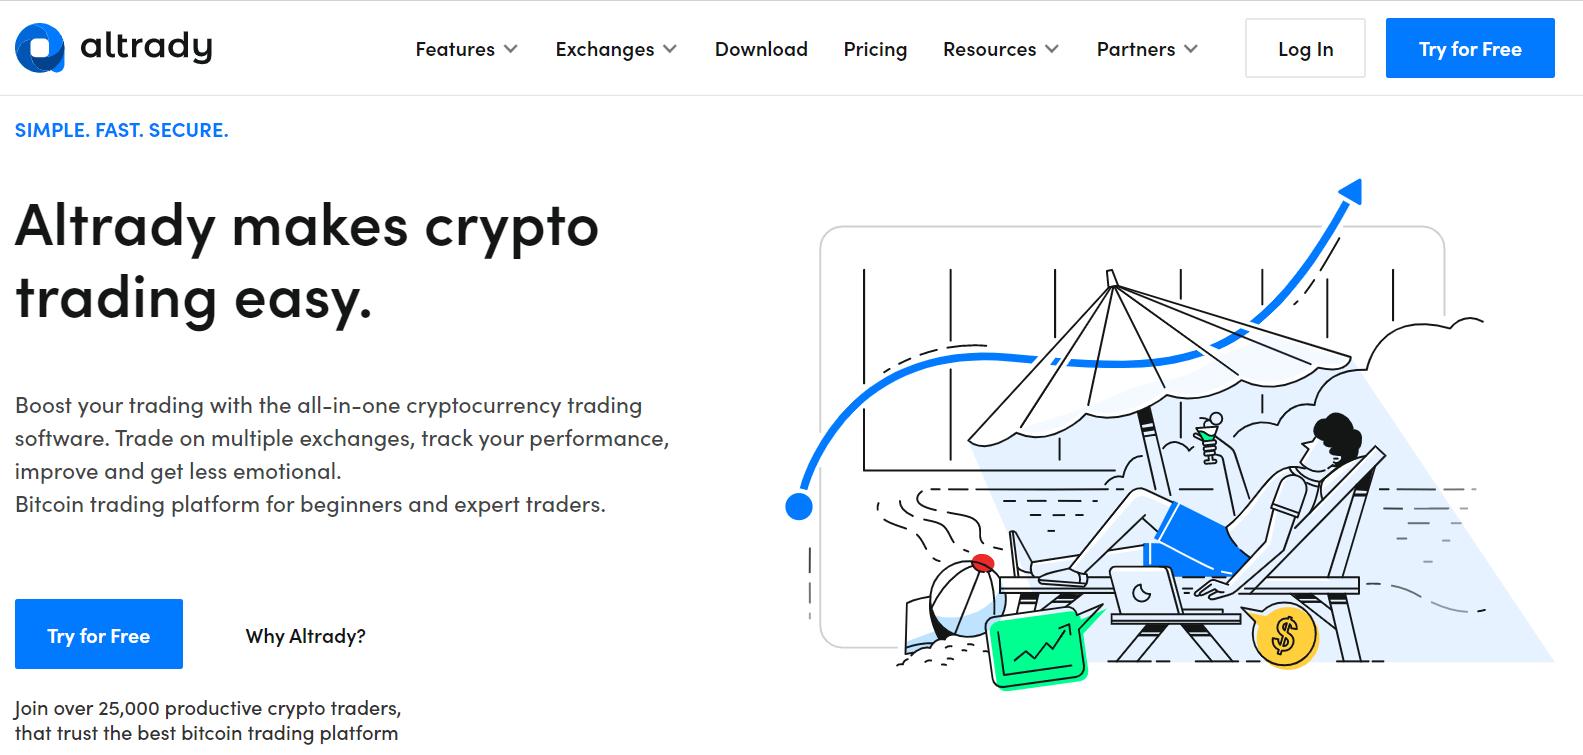 Altrady Bitcoin Trading Platform